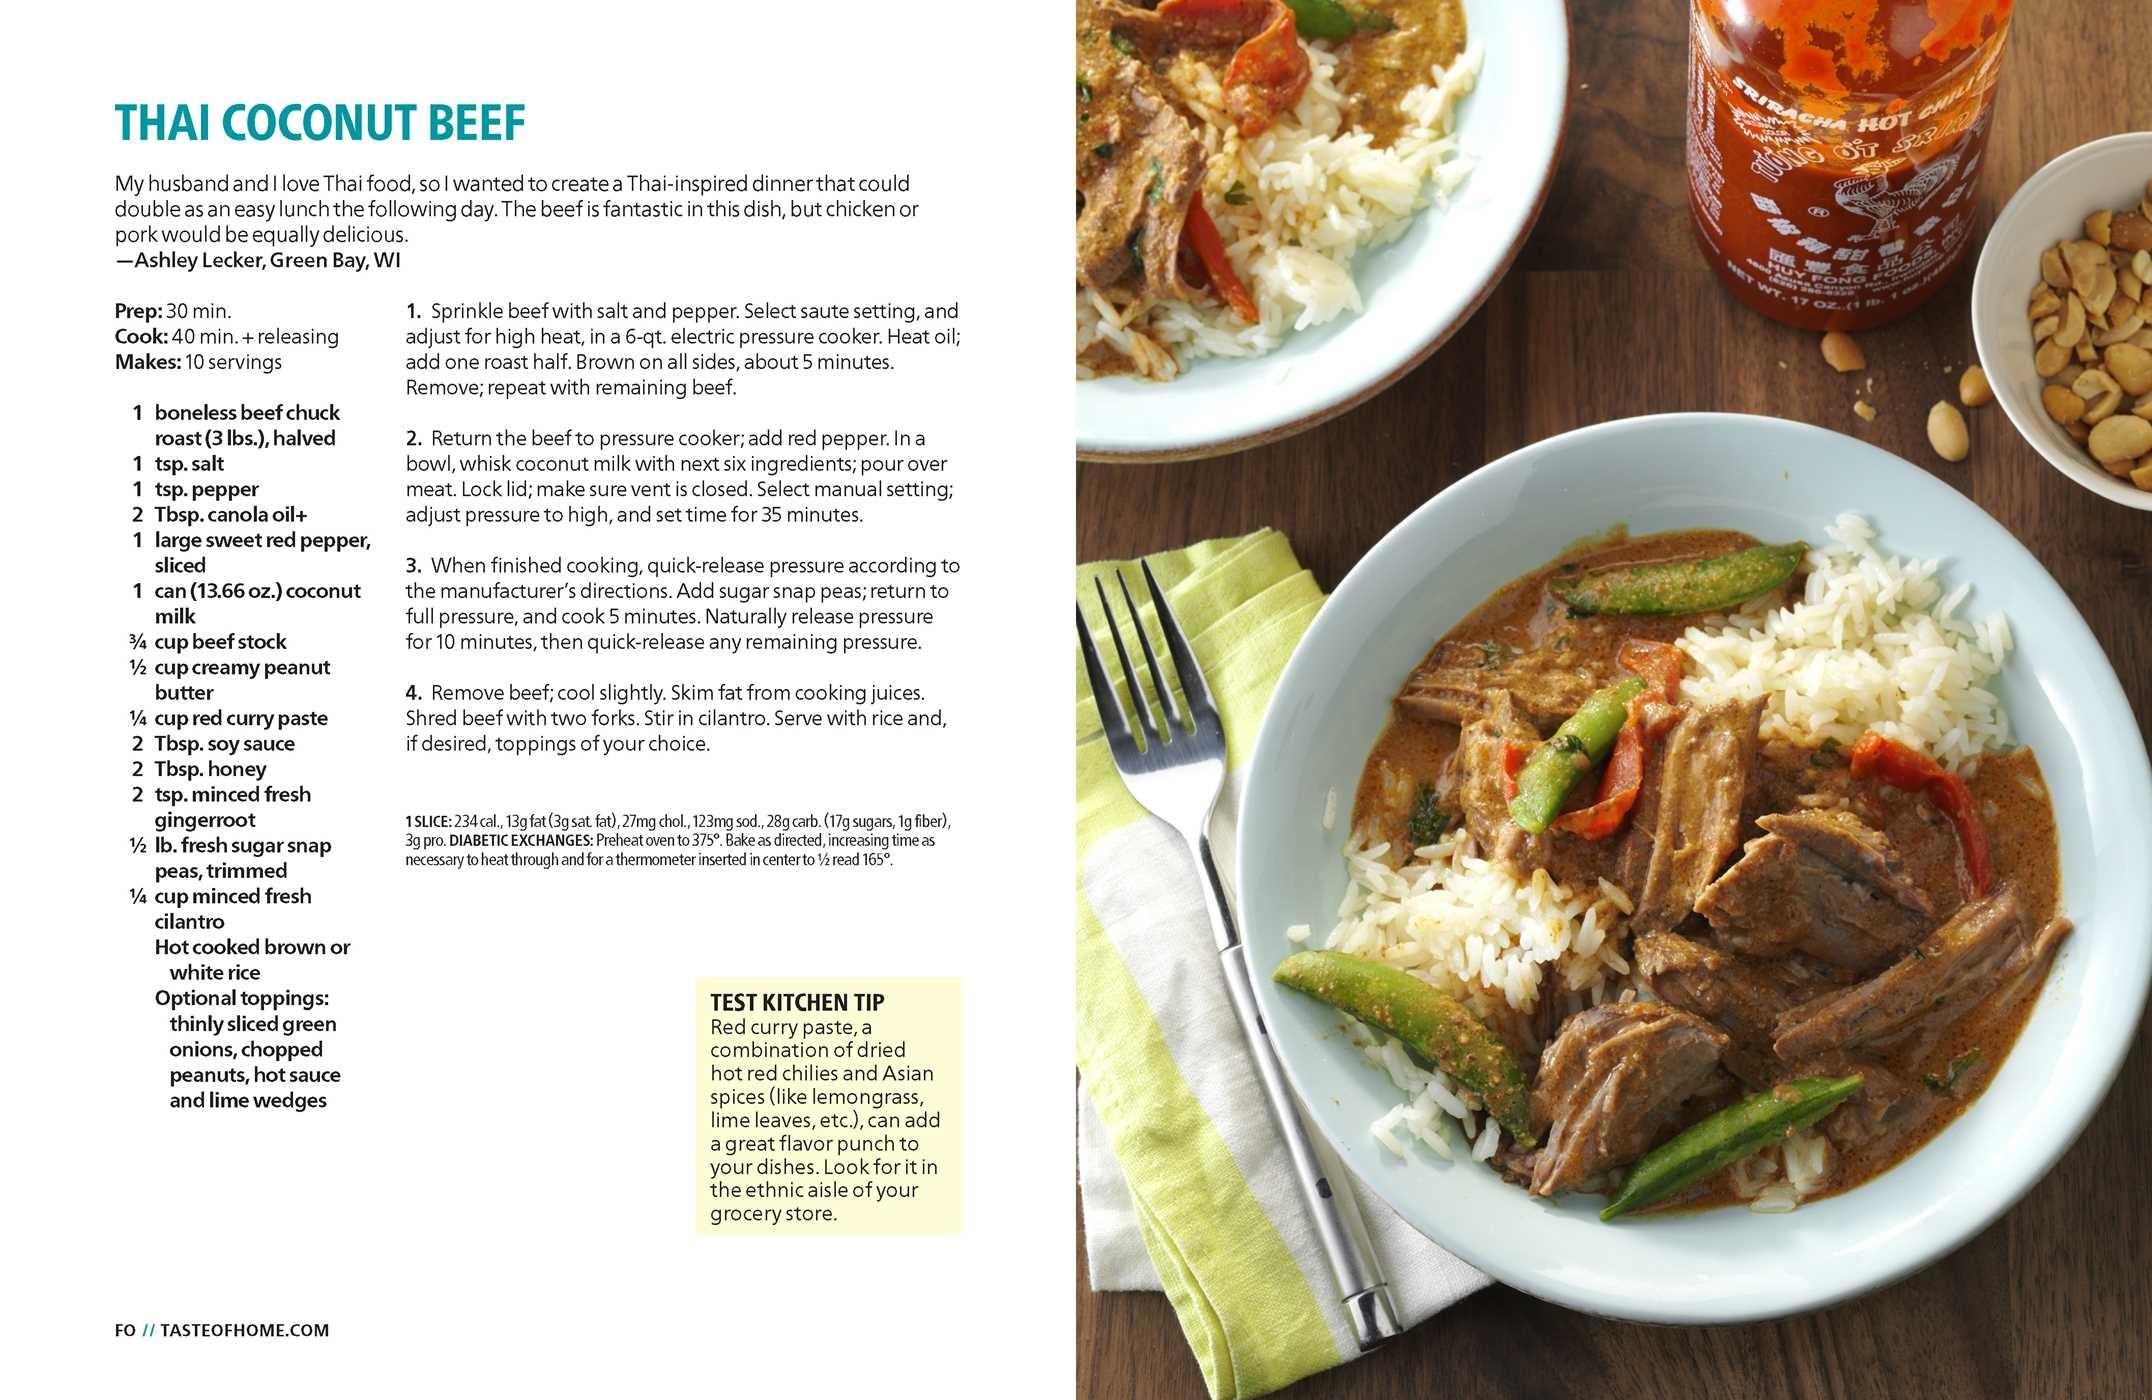 Taste of home instant pot cookbook 9781617657665.in03